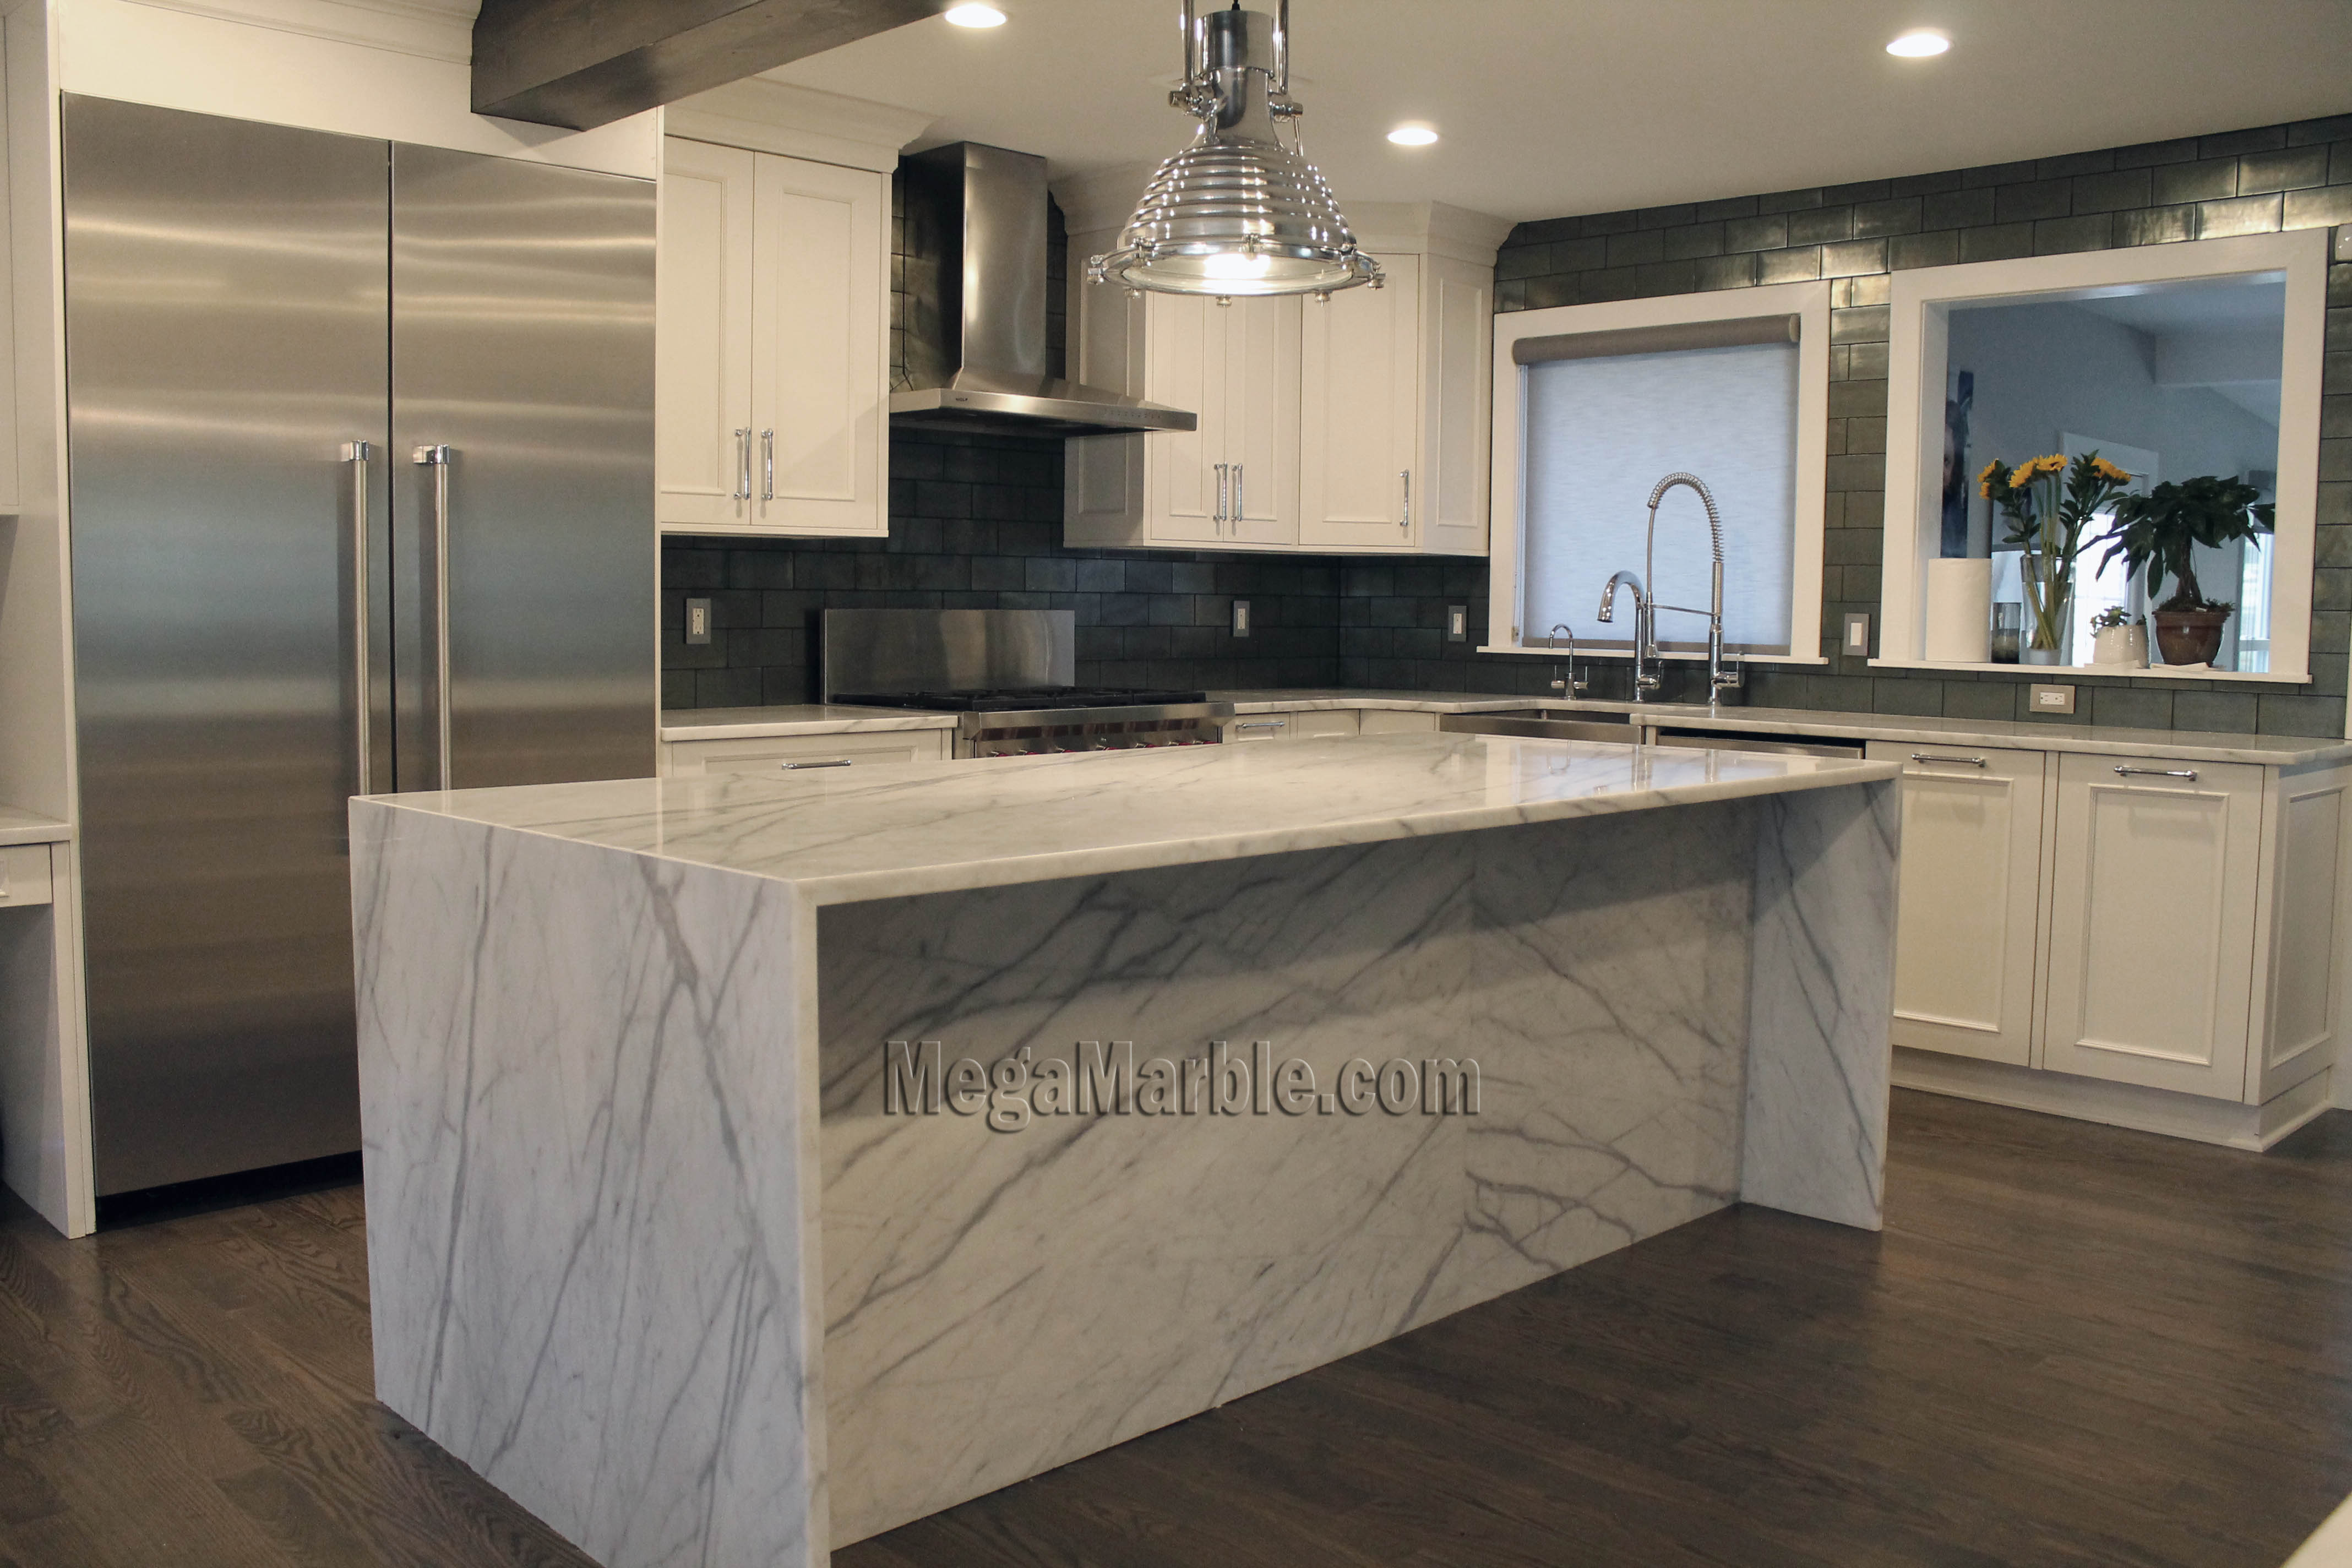 concepts stone kitchen countertop surfaces countertops unique options